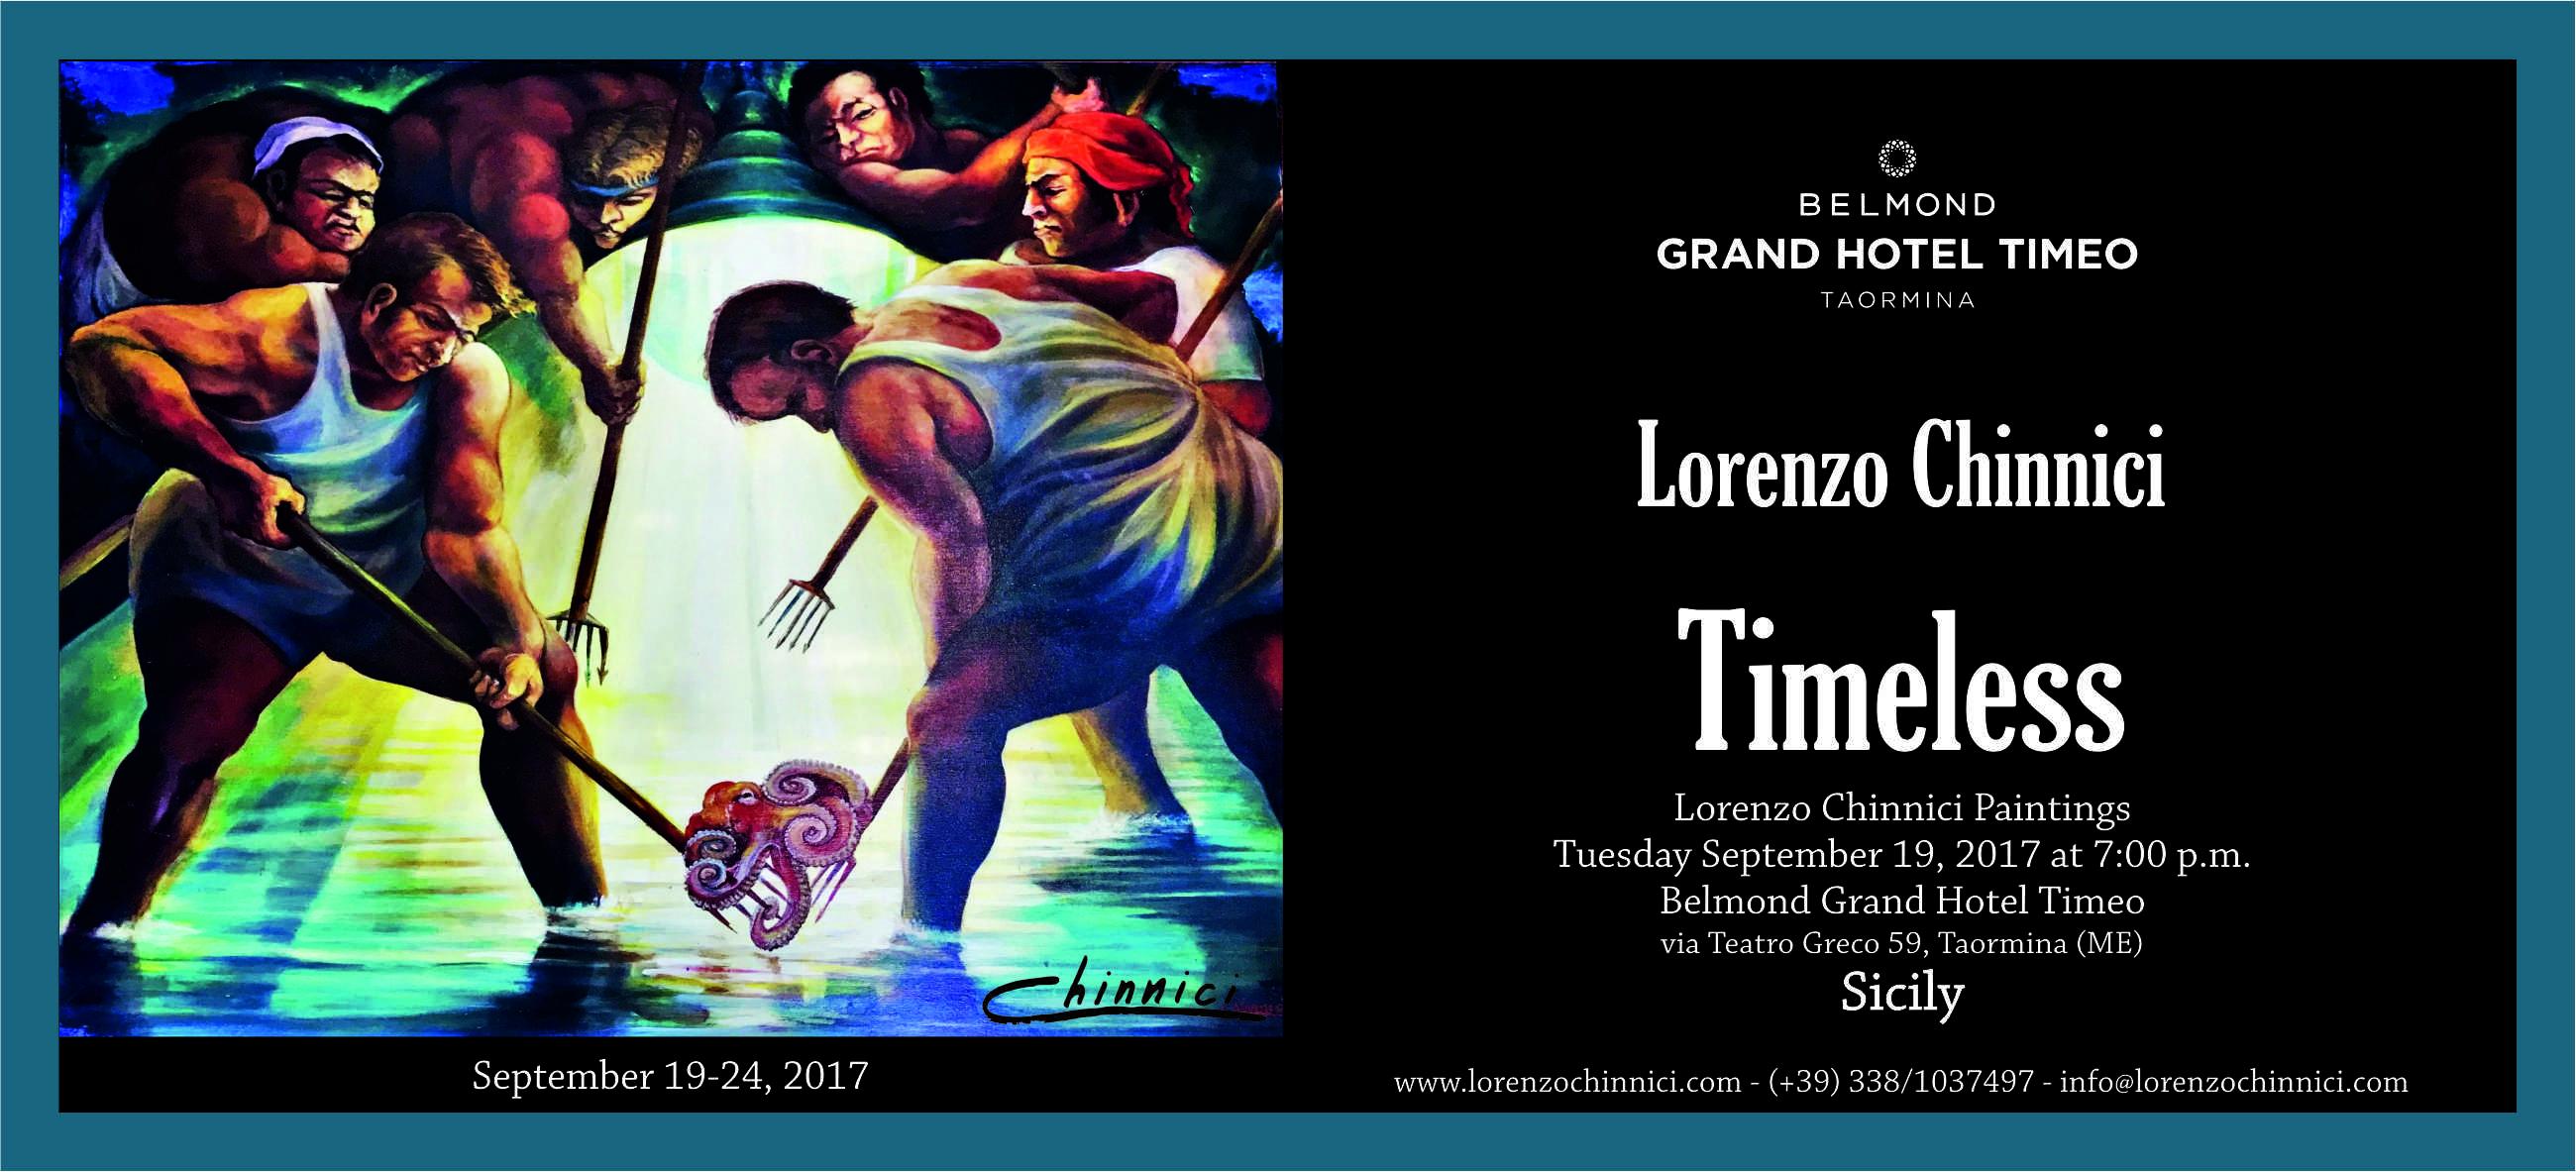 TIMELESS' AT BELMOND GRAND HOTEL TIMEO